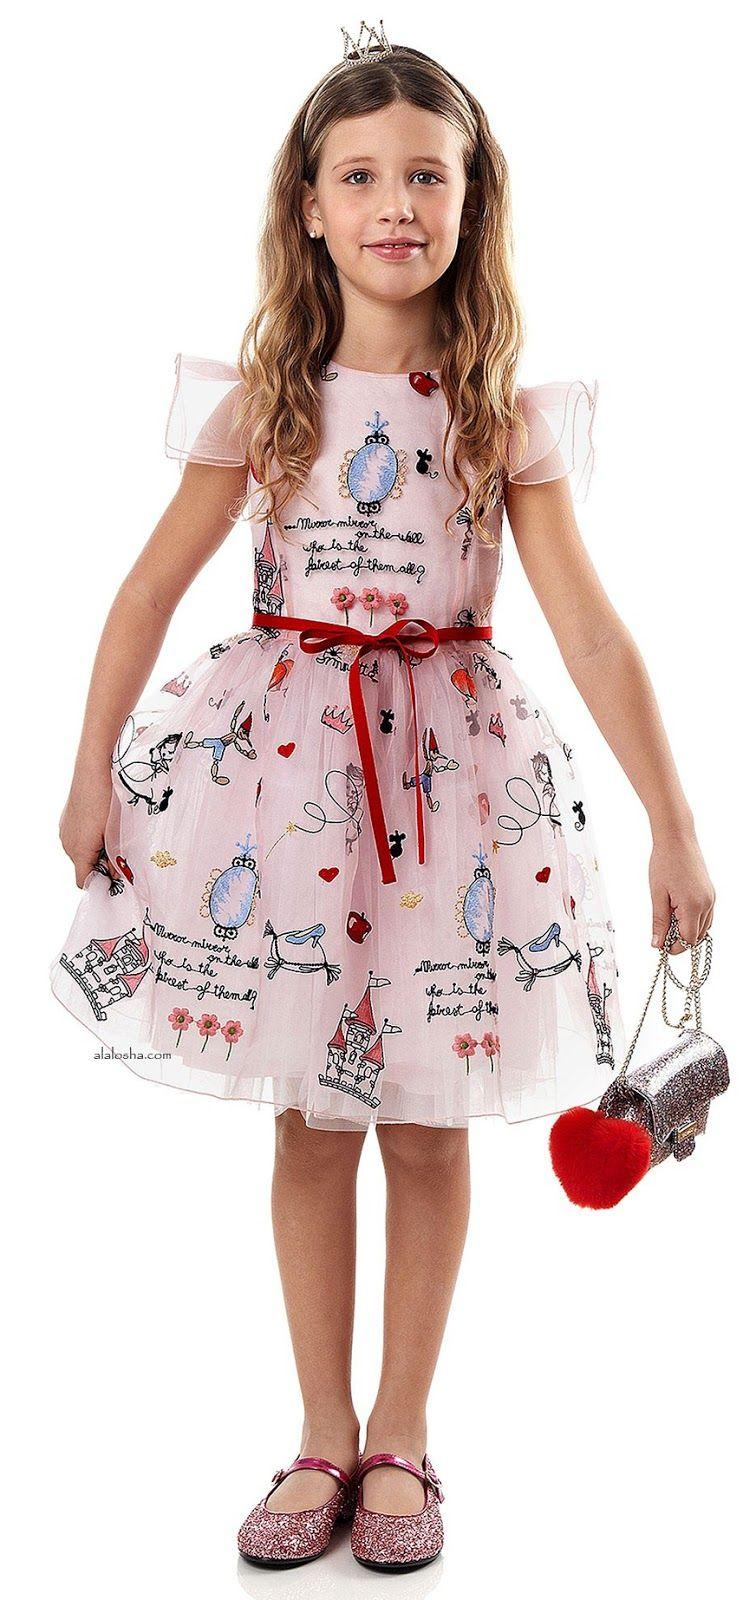 alalosha vogue enfants oh those dresses those colors meet